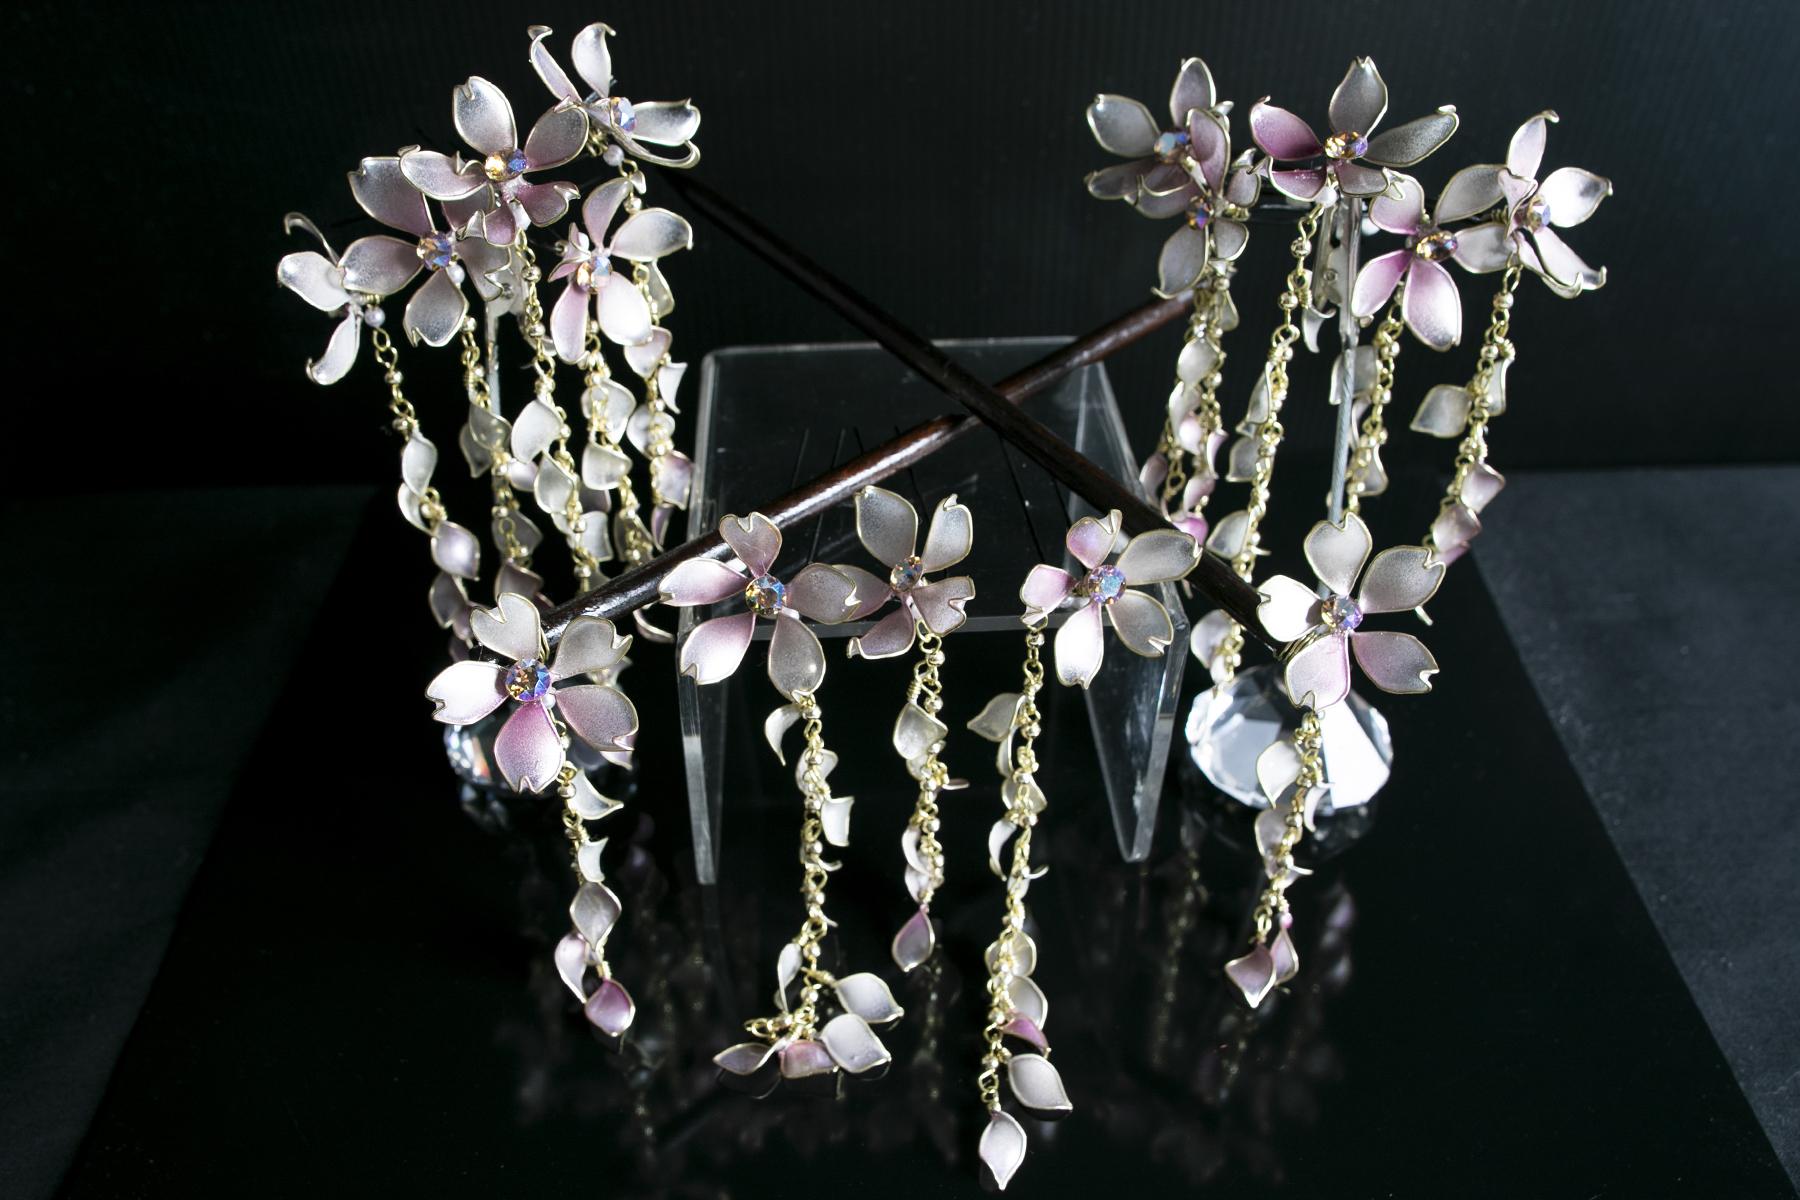 【絢爛】ー灰銀桜 cherry of ash silver